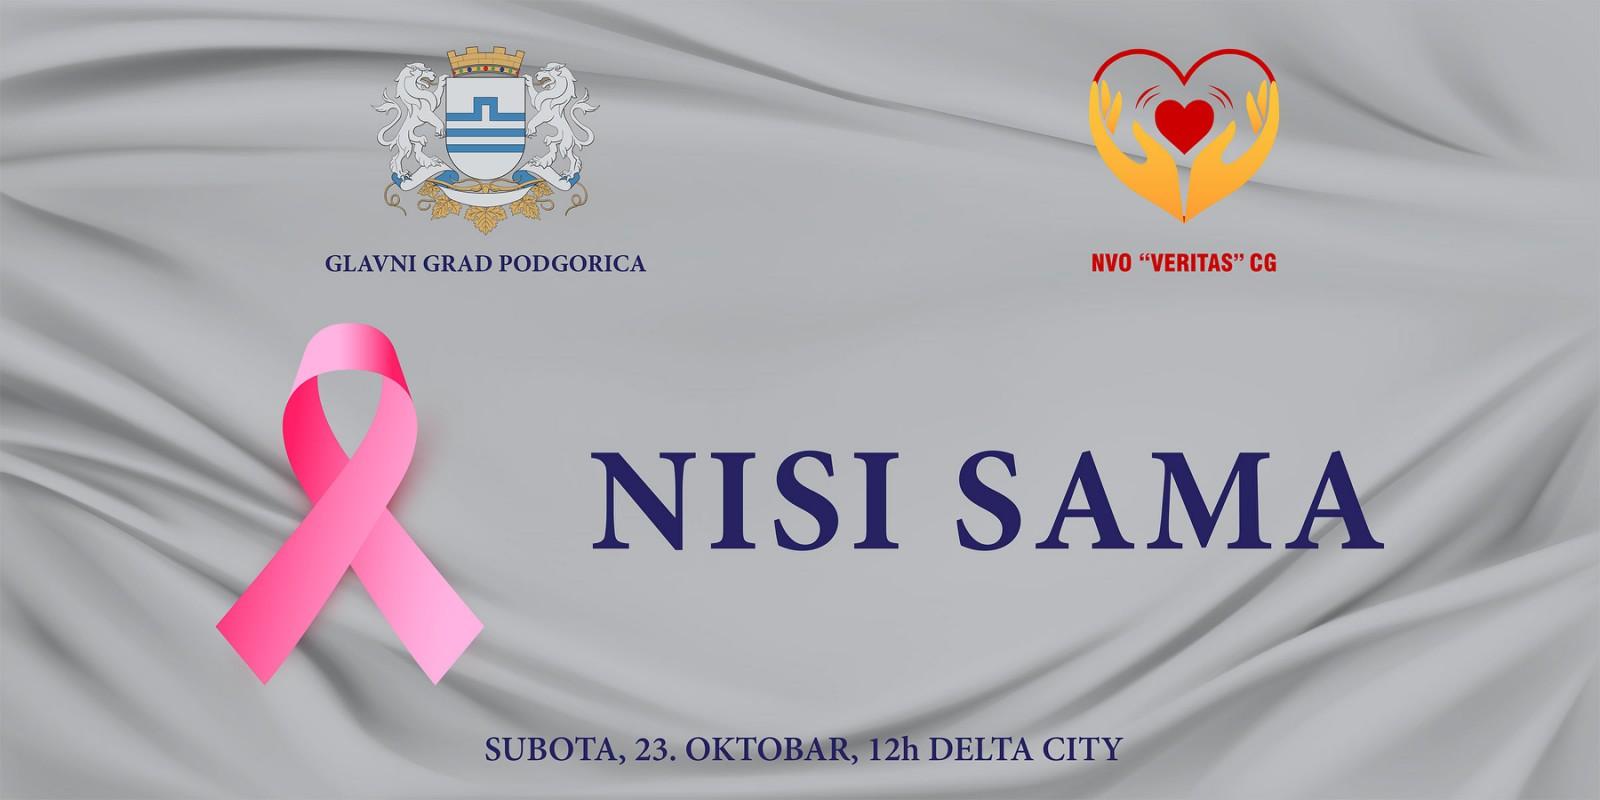 Najava: Obilježavanje Dana borbe protiv karcinoma dojke u okviru Ružičastog oktobra